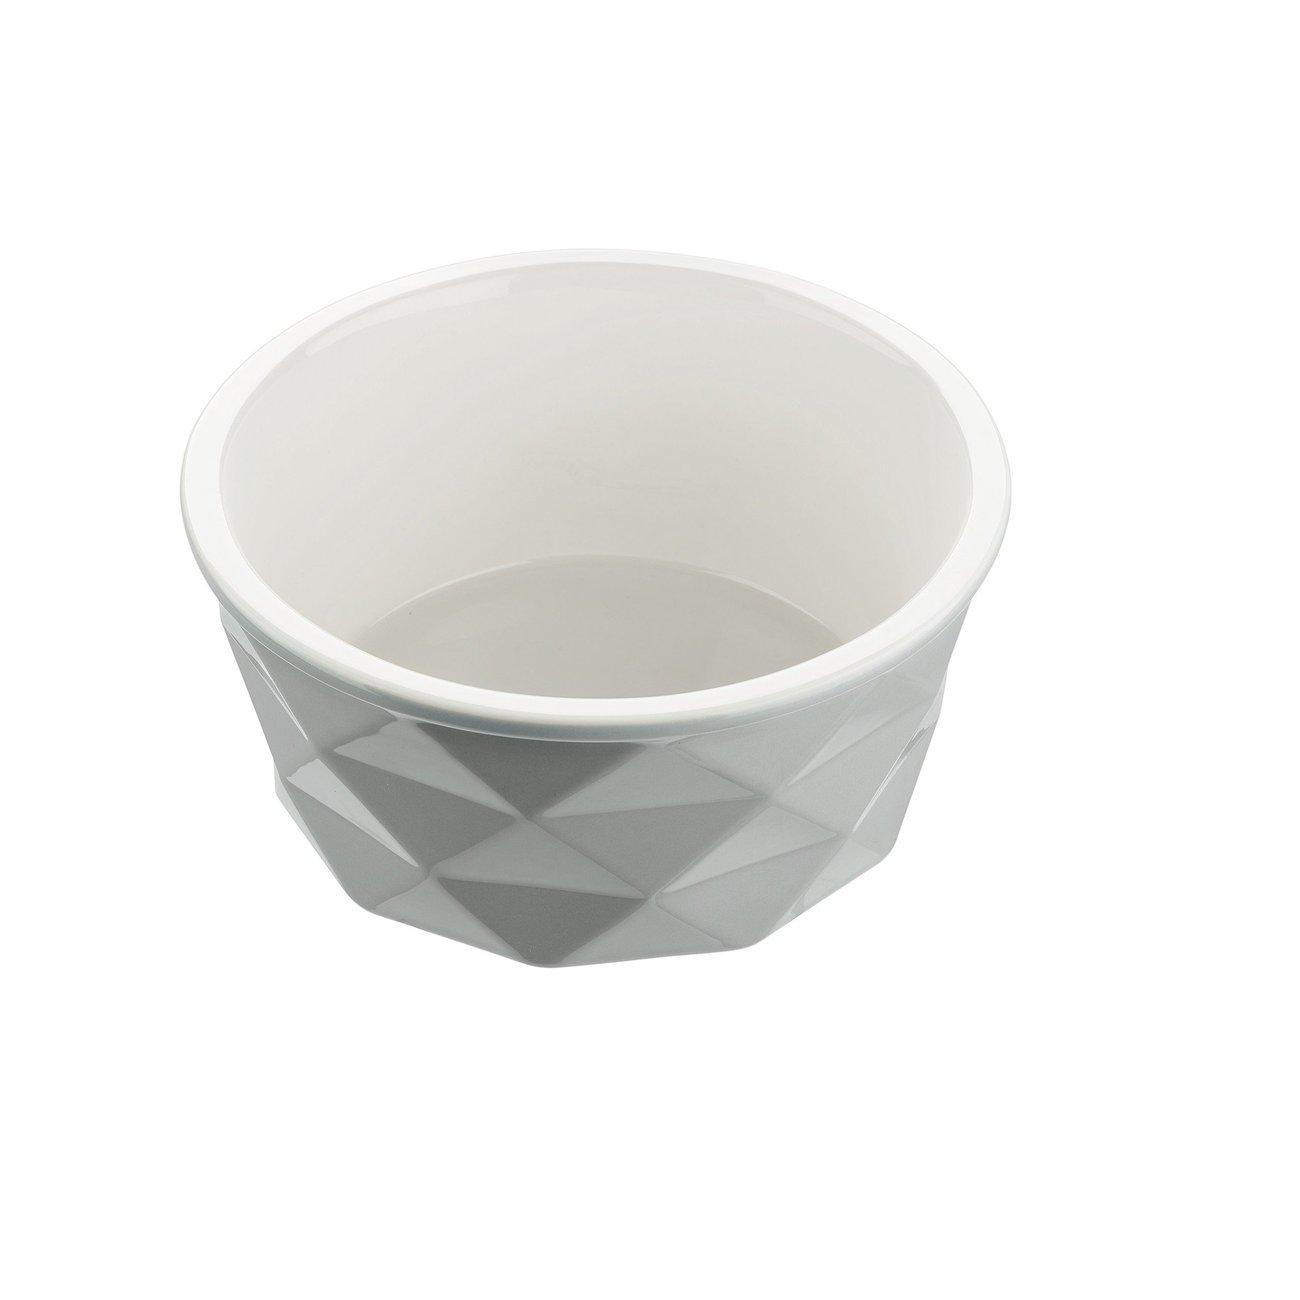 Hunter Keramik Napf Eiby 68648, Bild 8